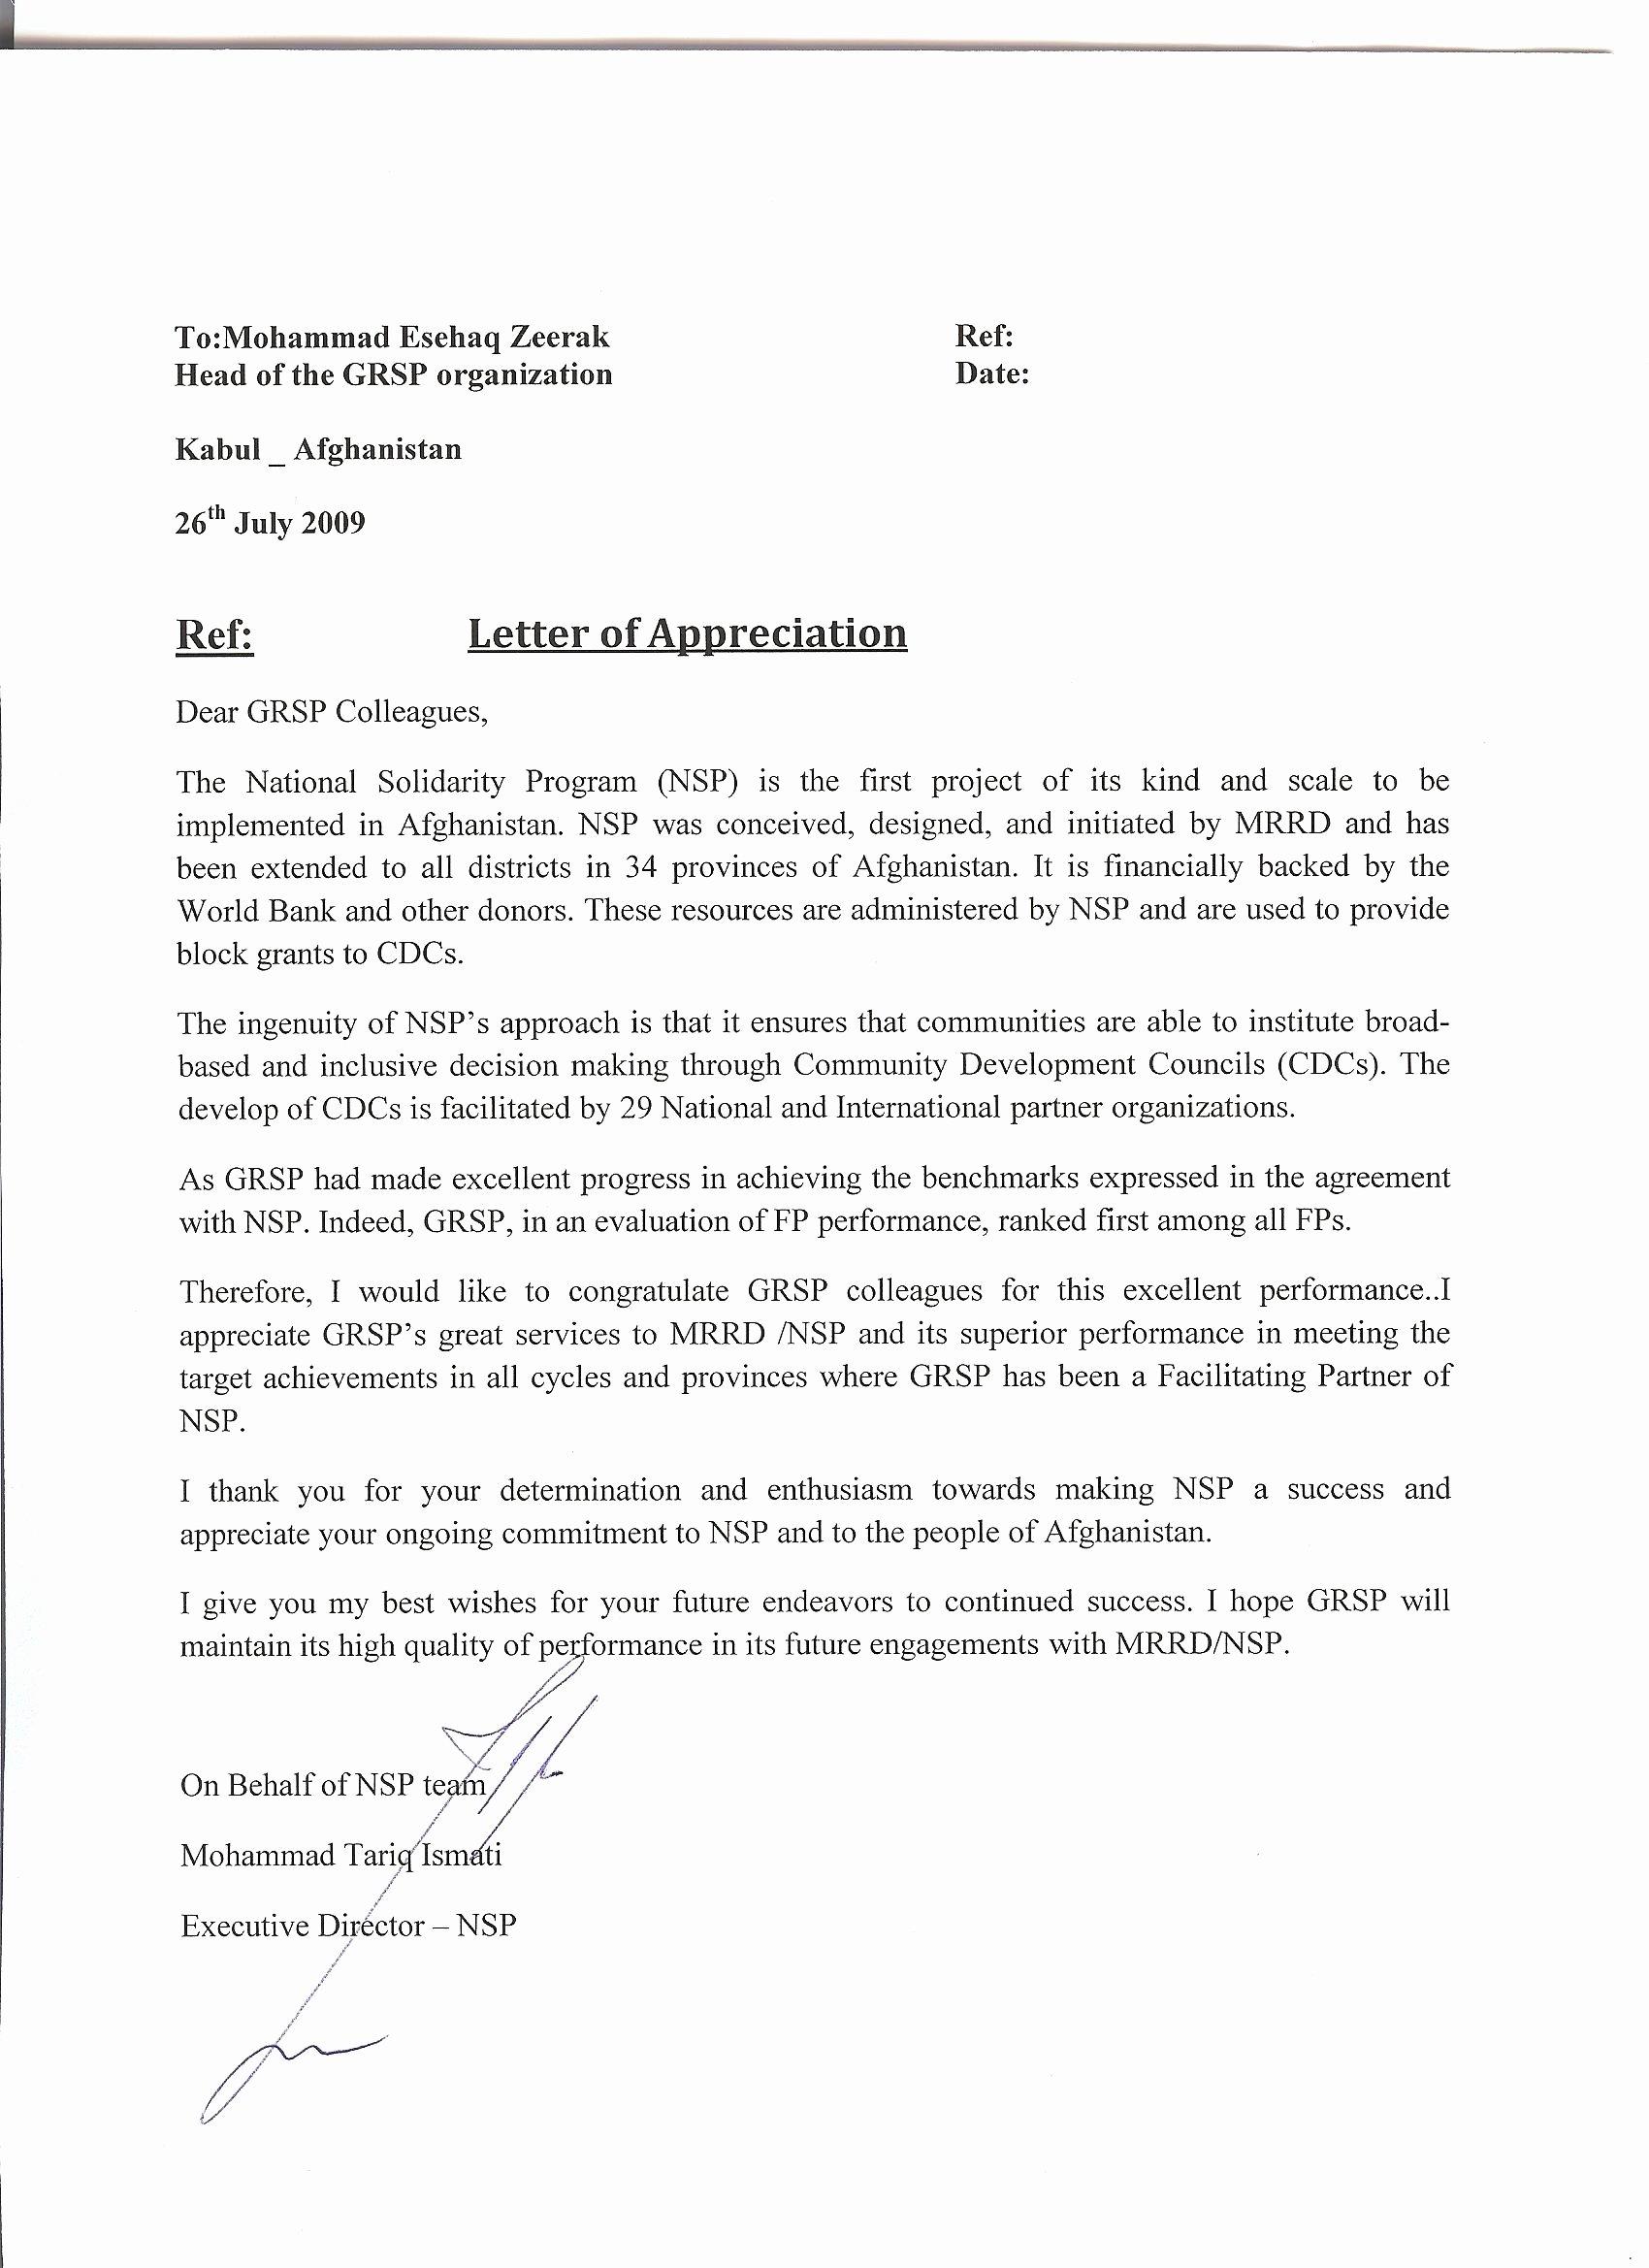 Letters Of Appreciation Template Fresh Appreciation Letter